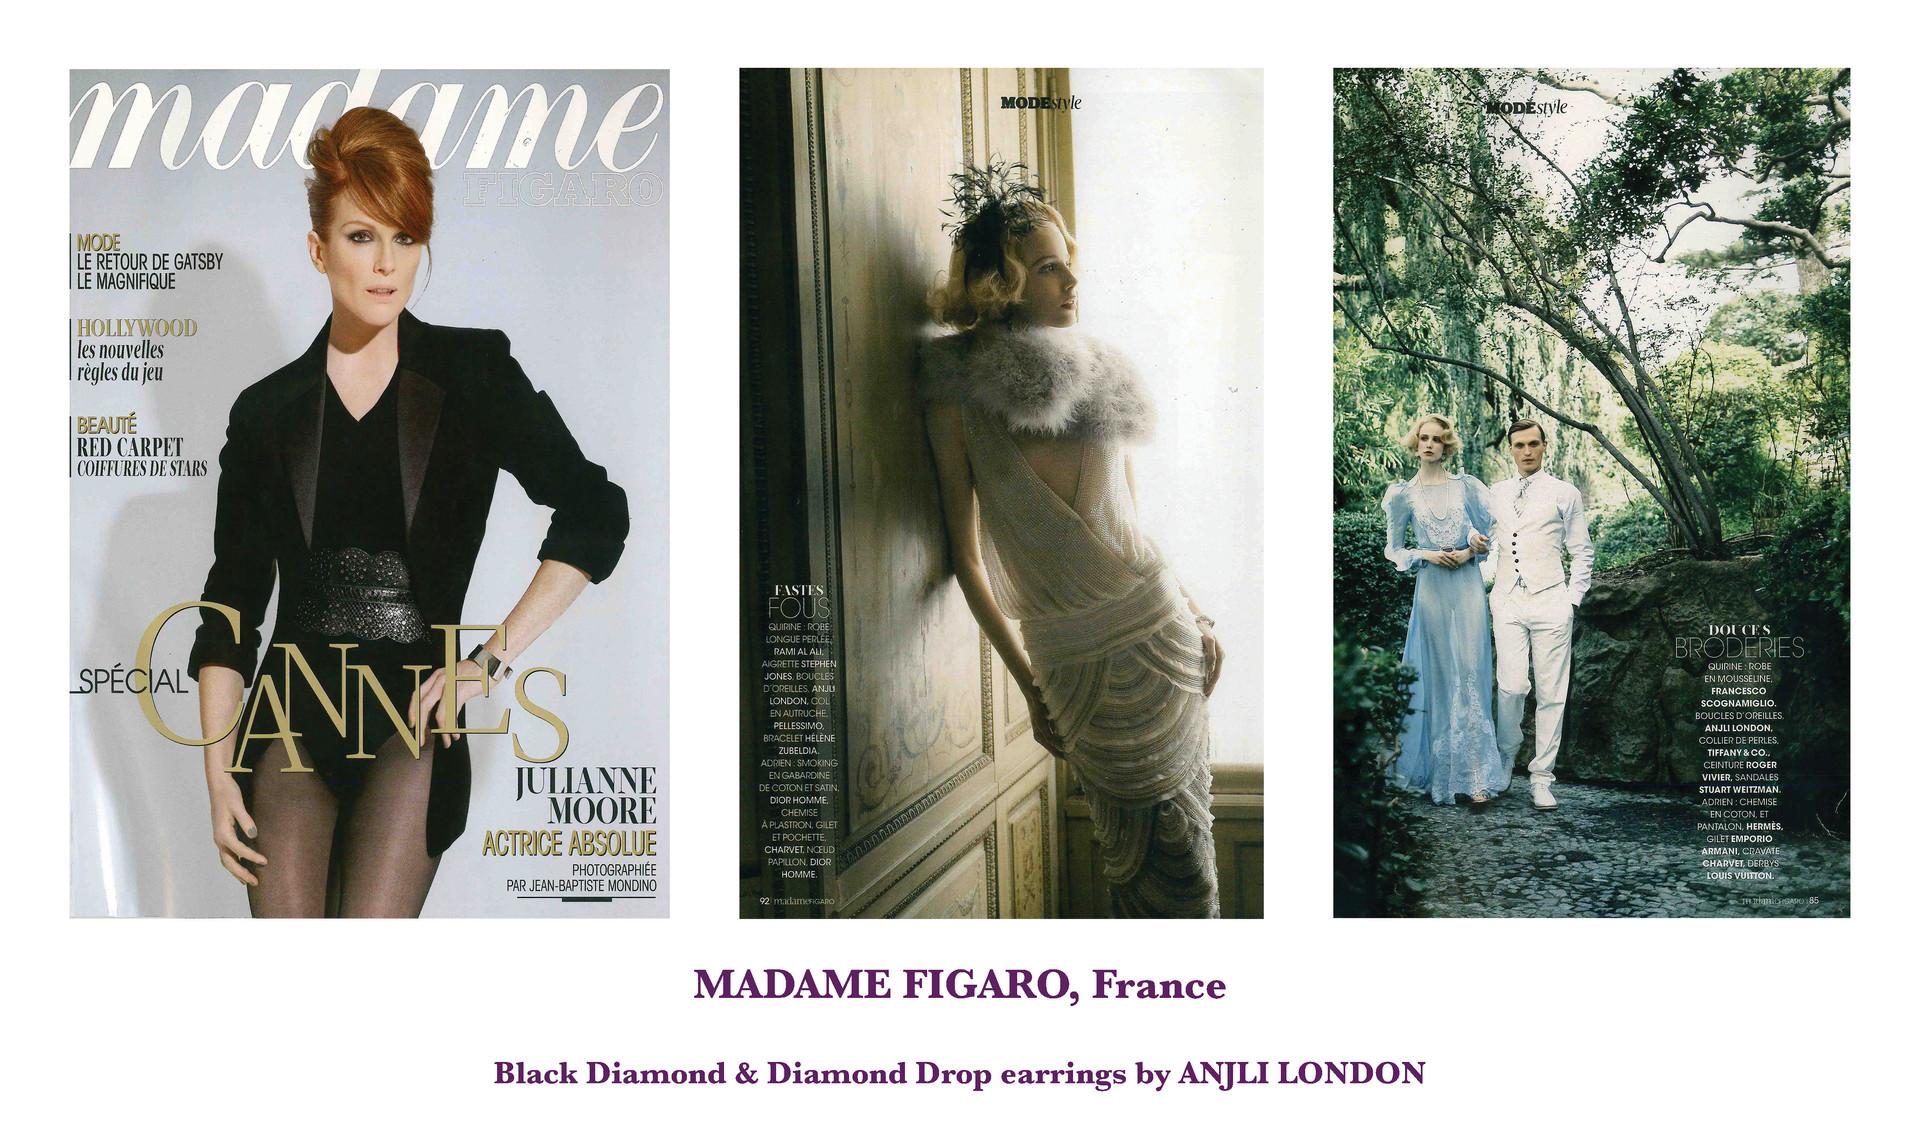 MADAME FIGARO, France